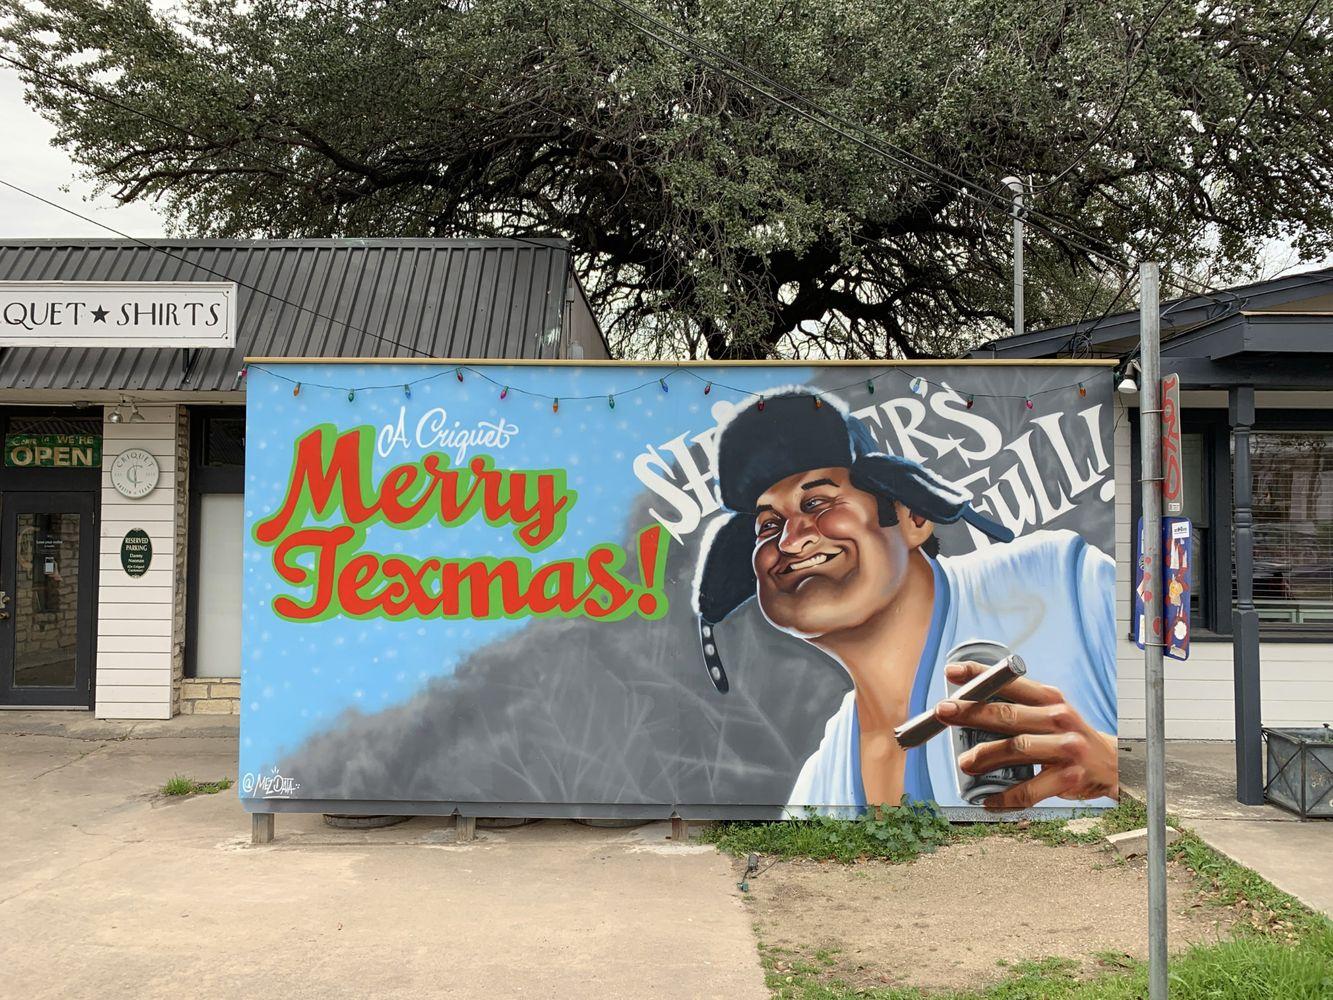 Merry Texmas Austin Murals